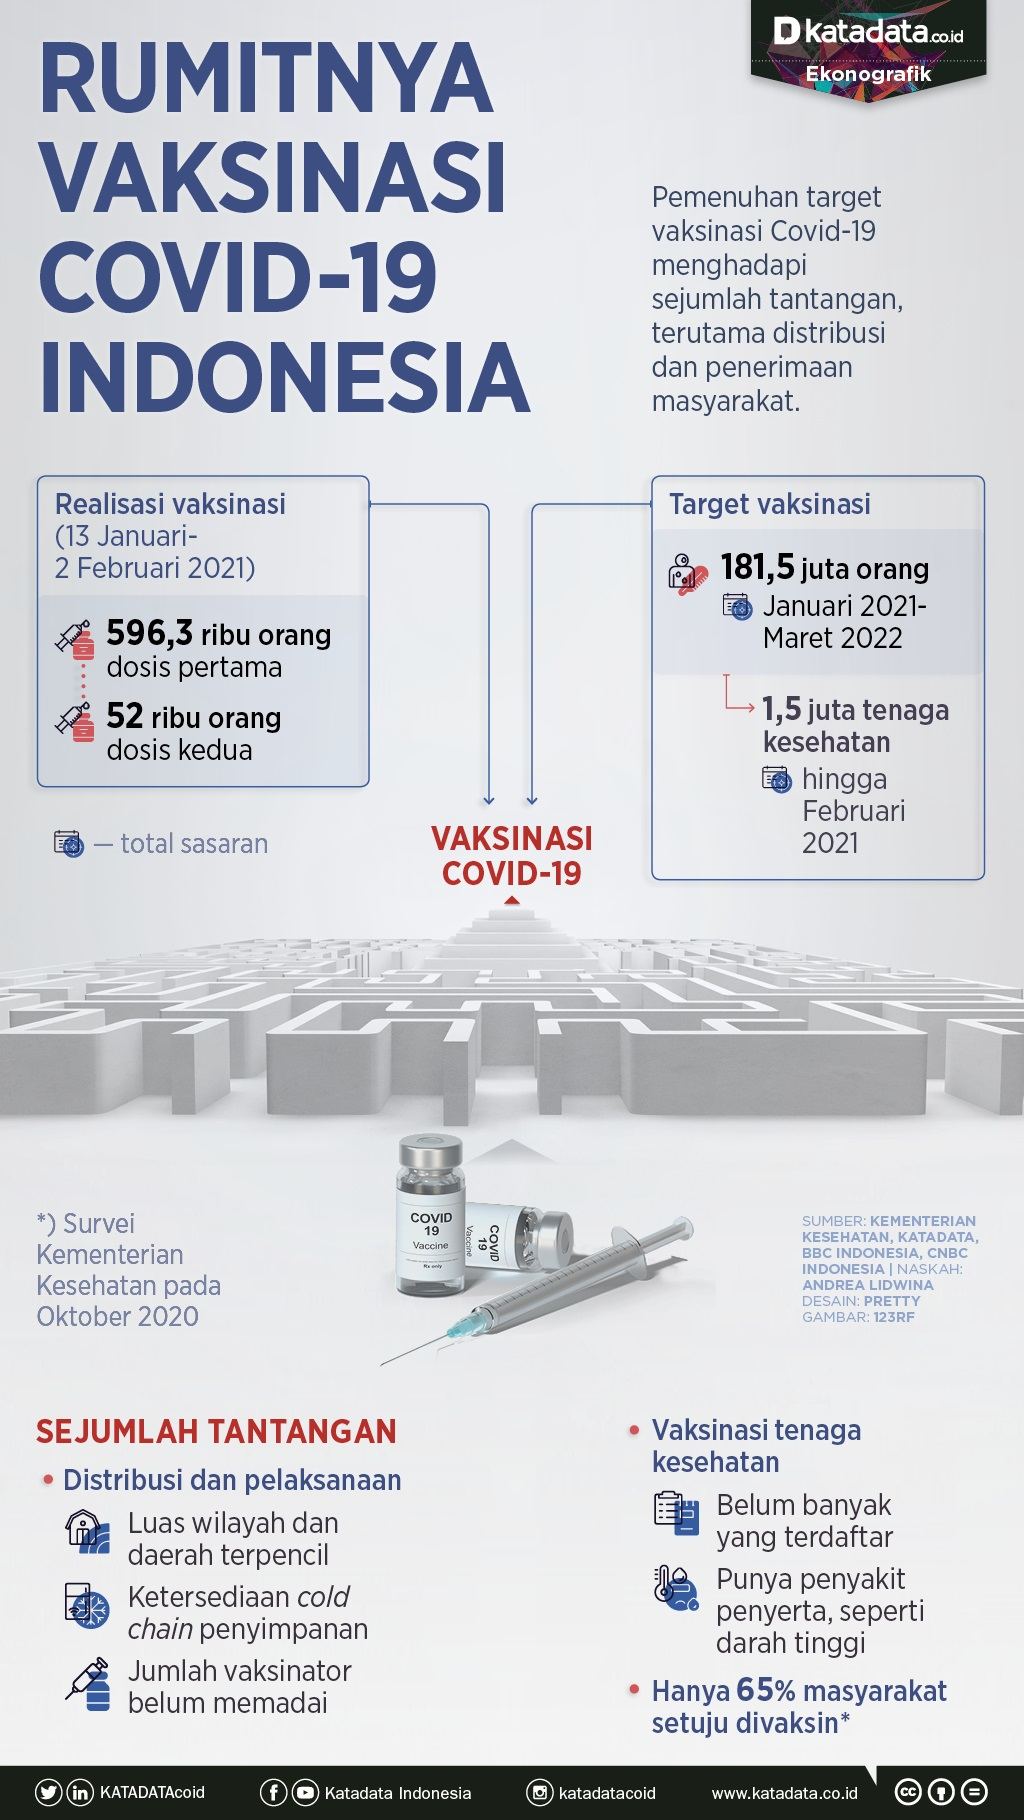 Infografik_Rumitnya vaksinasi covid-19 Indonesia